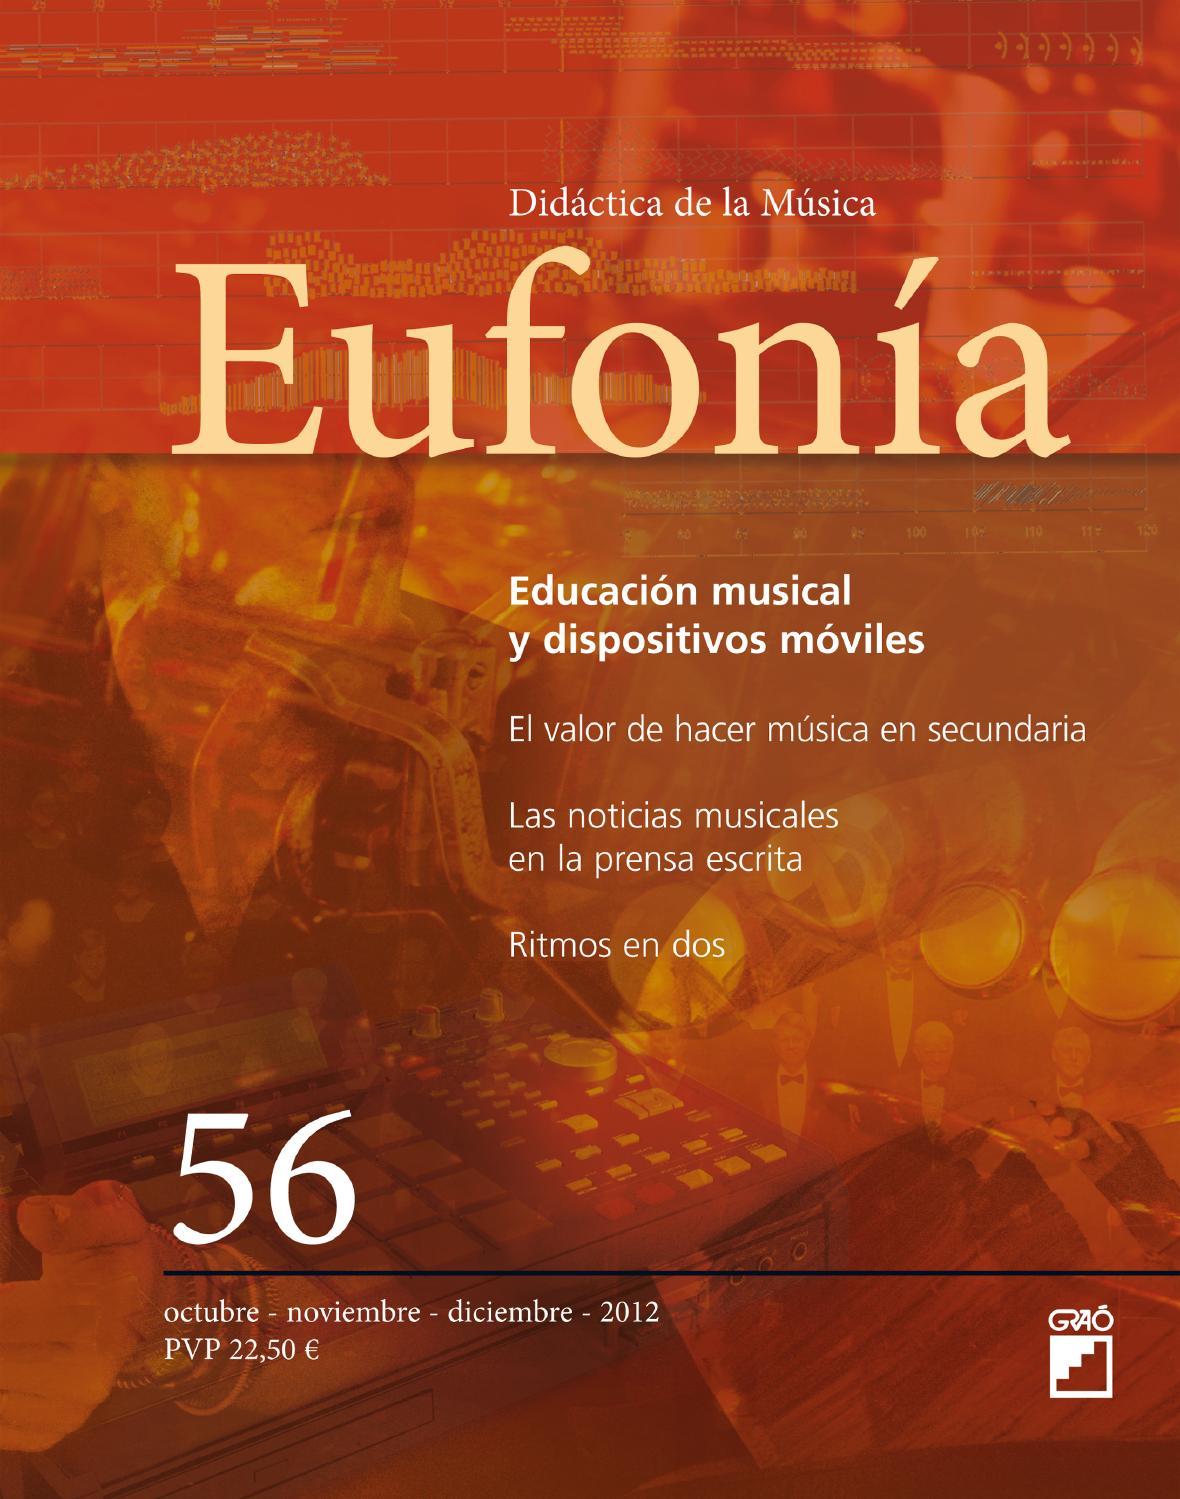 9a28d57dc45 ramon gener Array - eufon a did ctica de la m sica by editorial gra issuu  rh ...